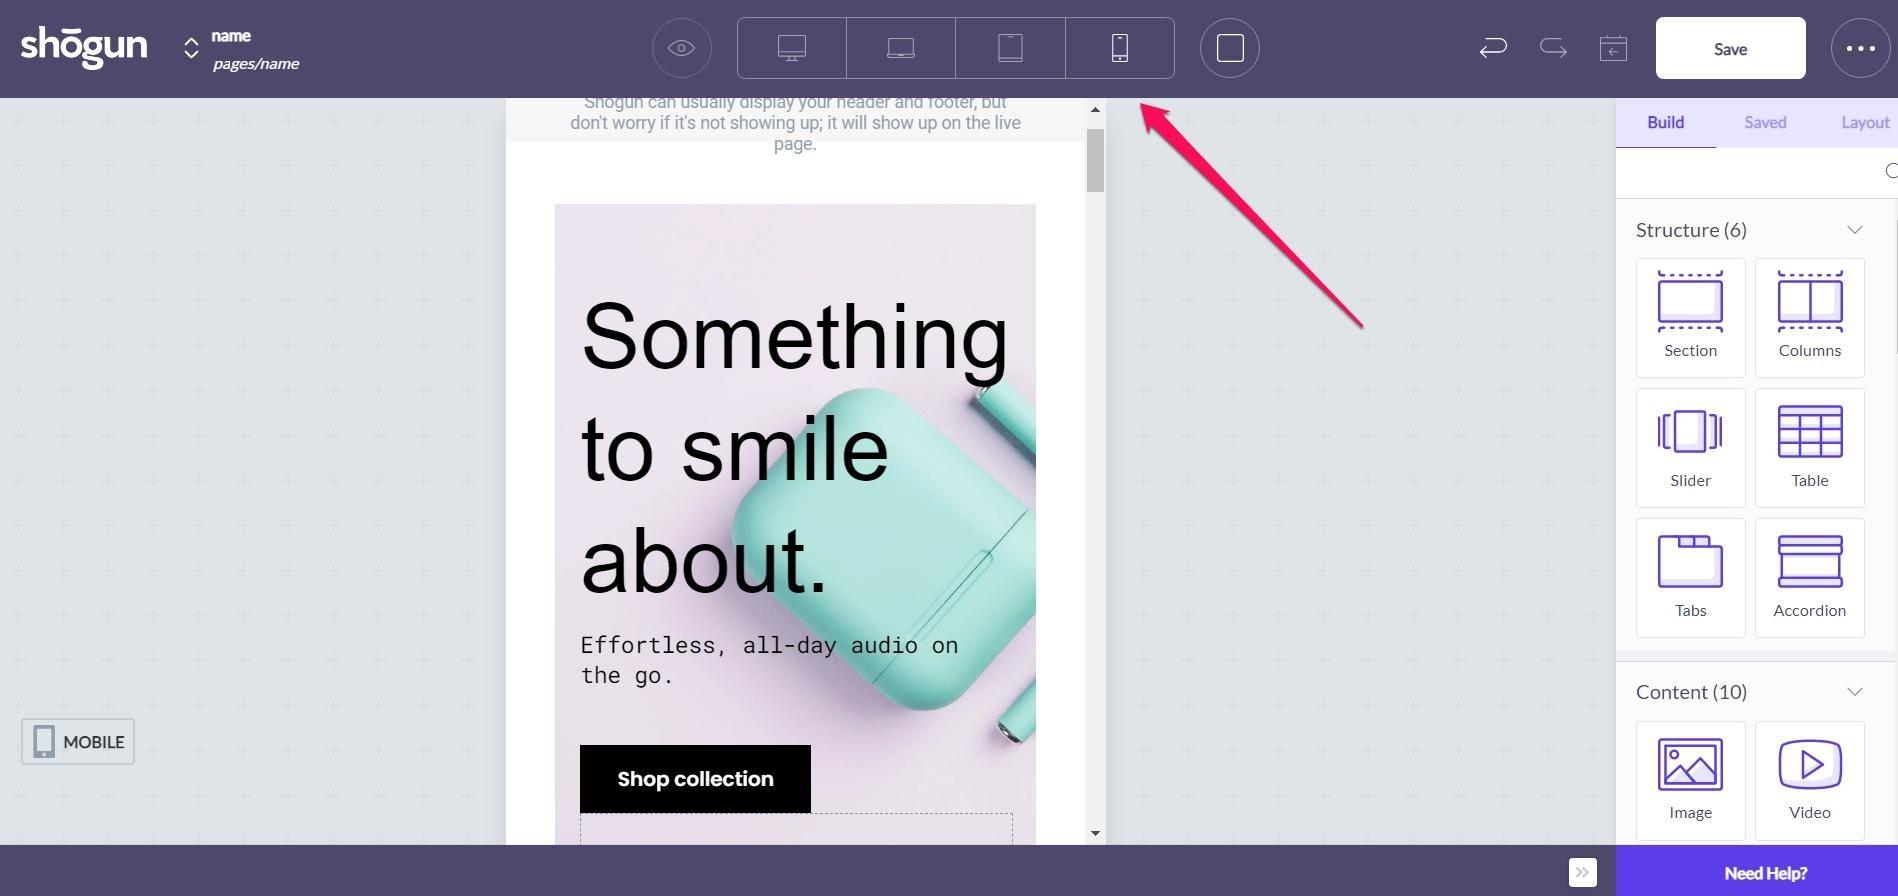 shogun page builder responsive screen size selector